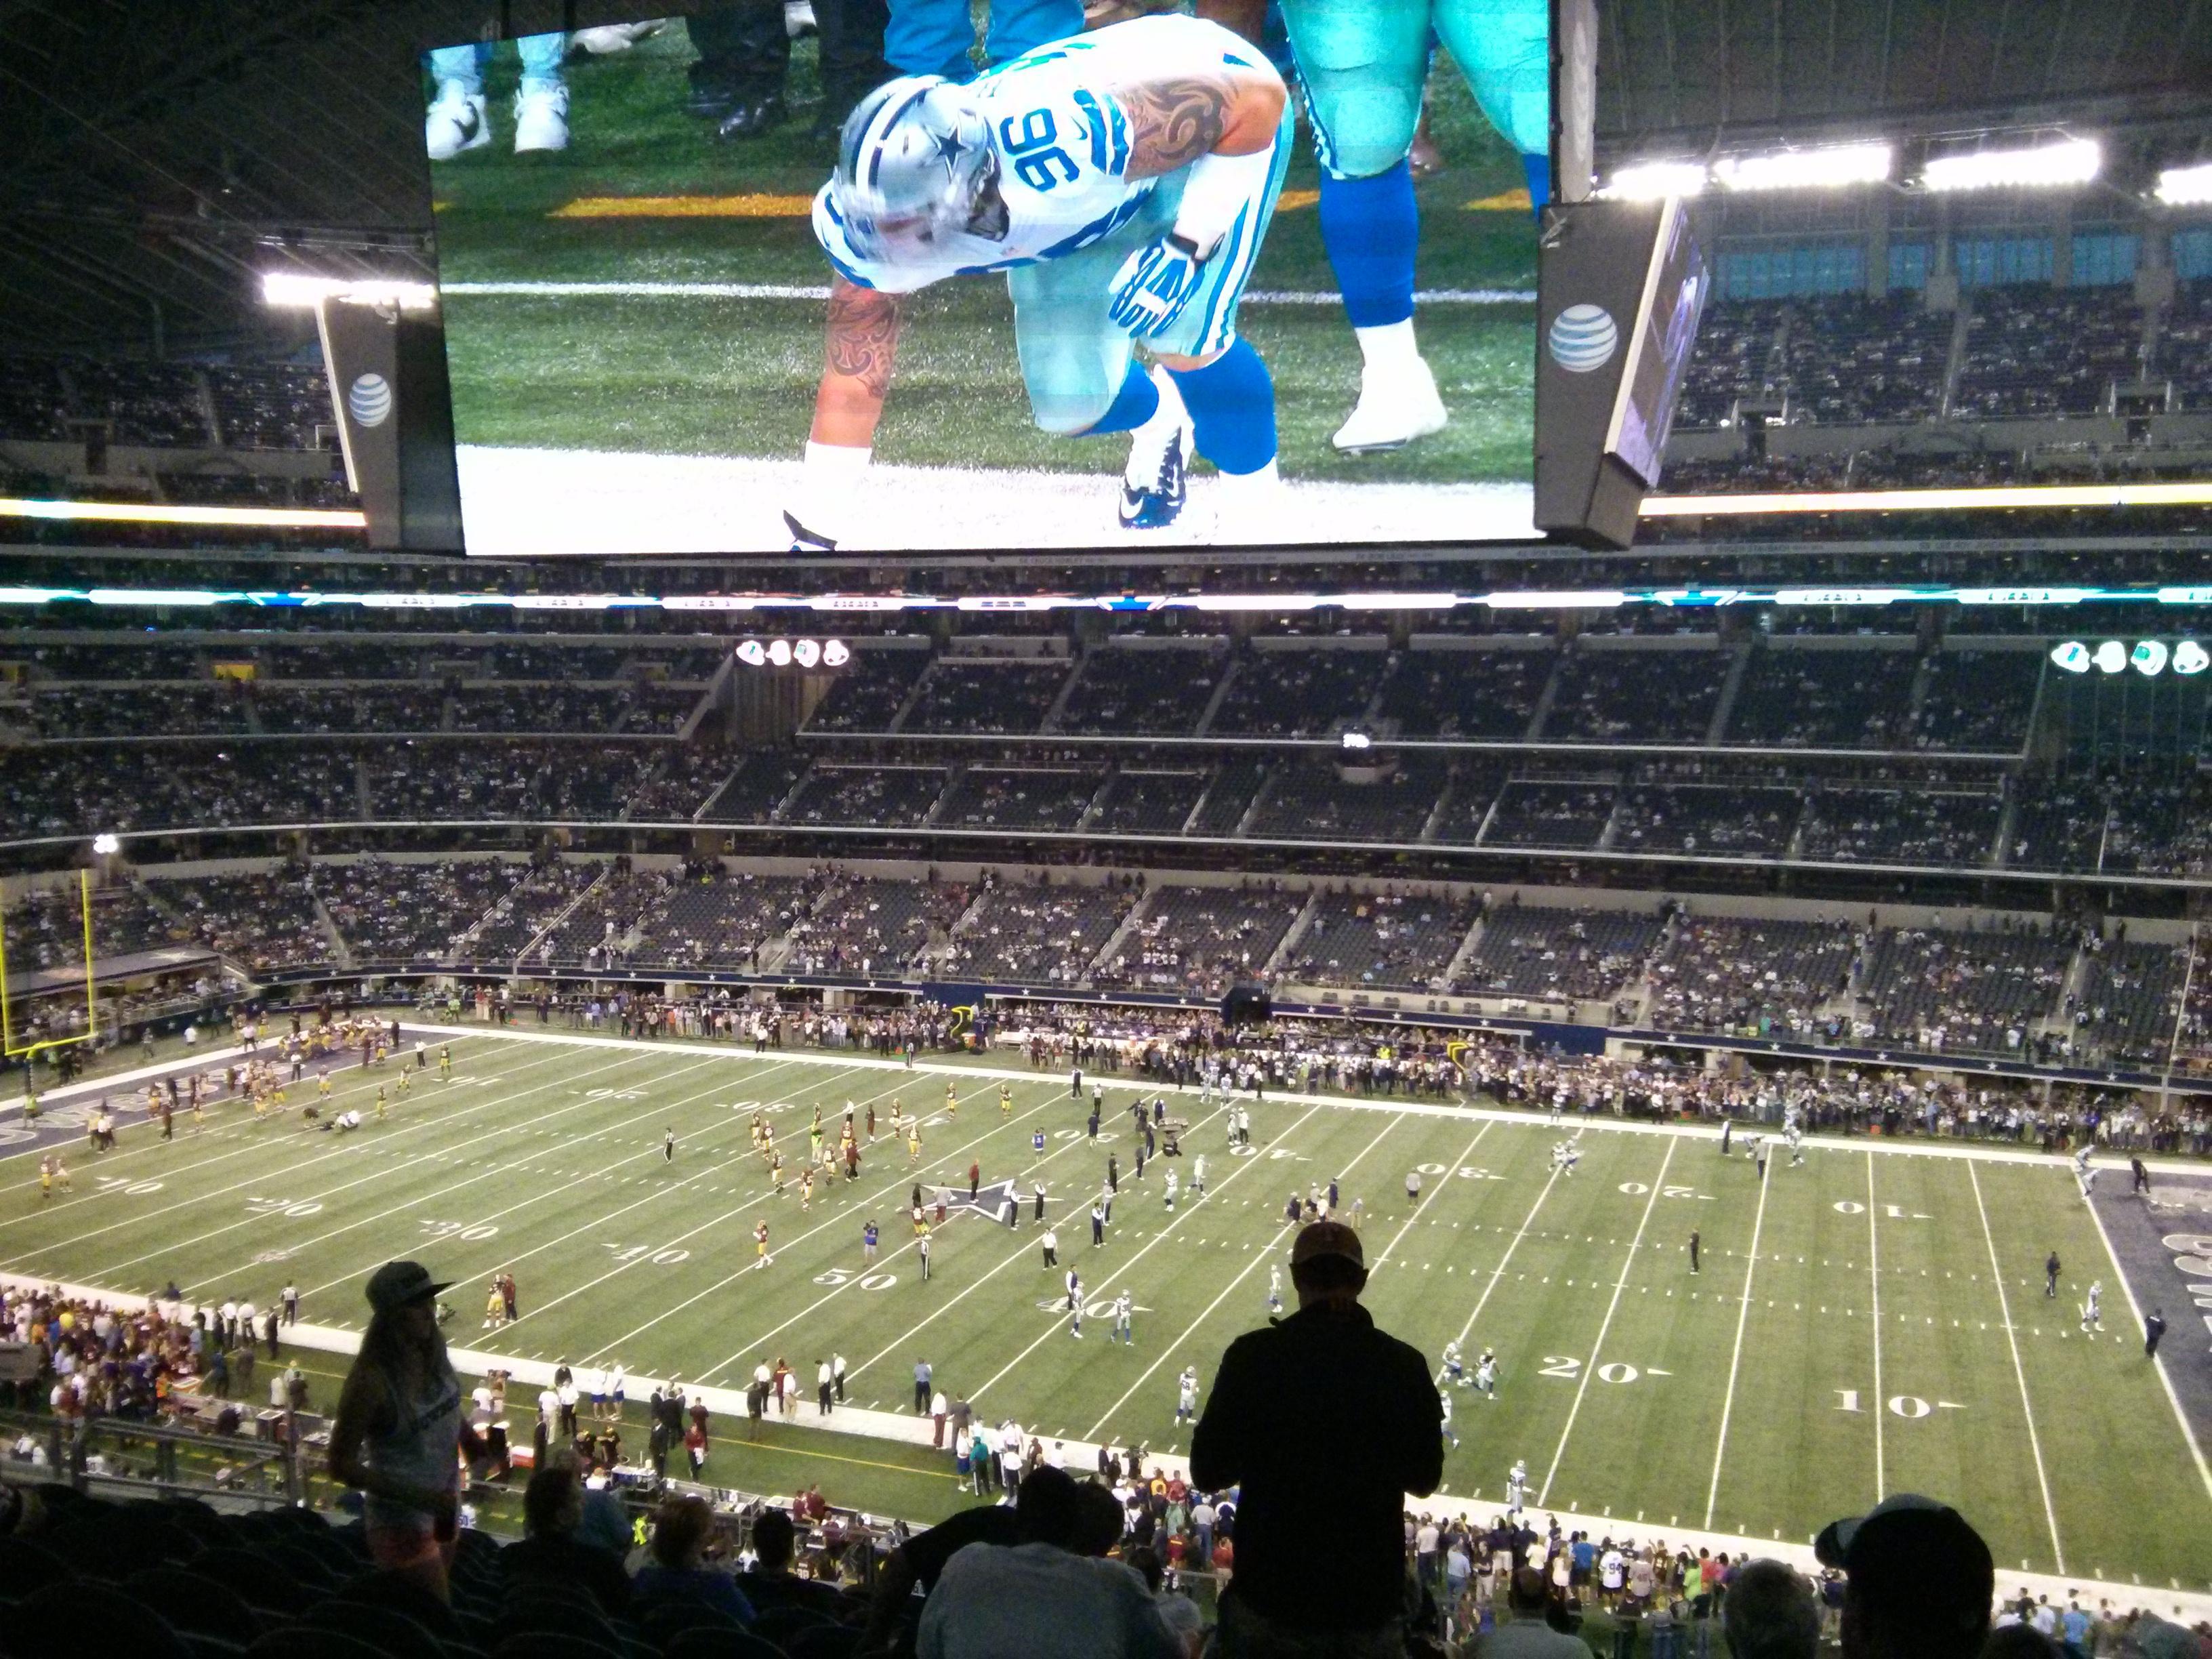 AT&T Stadium Section C333 Row 13 Seat 9